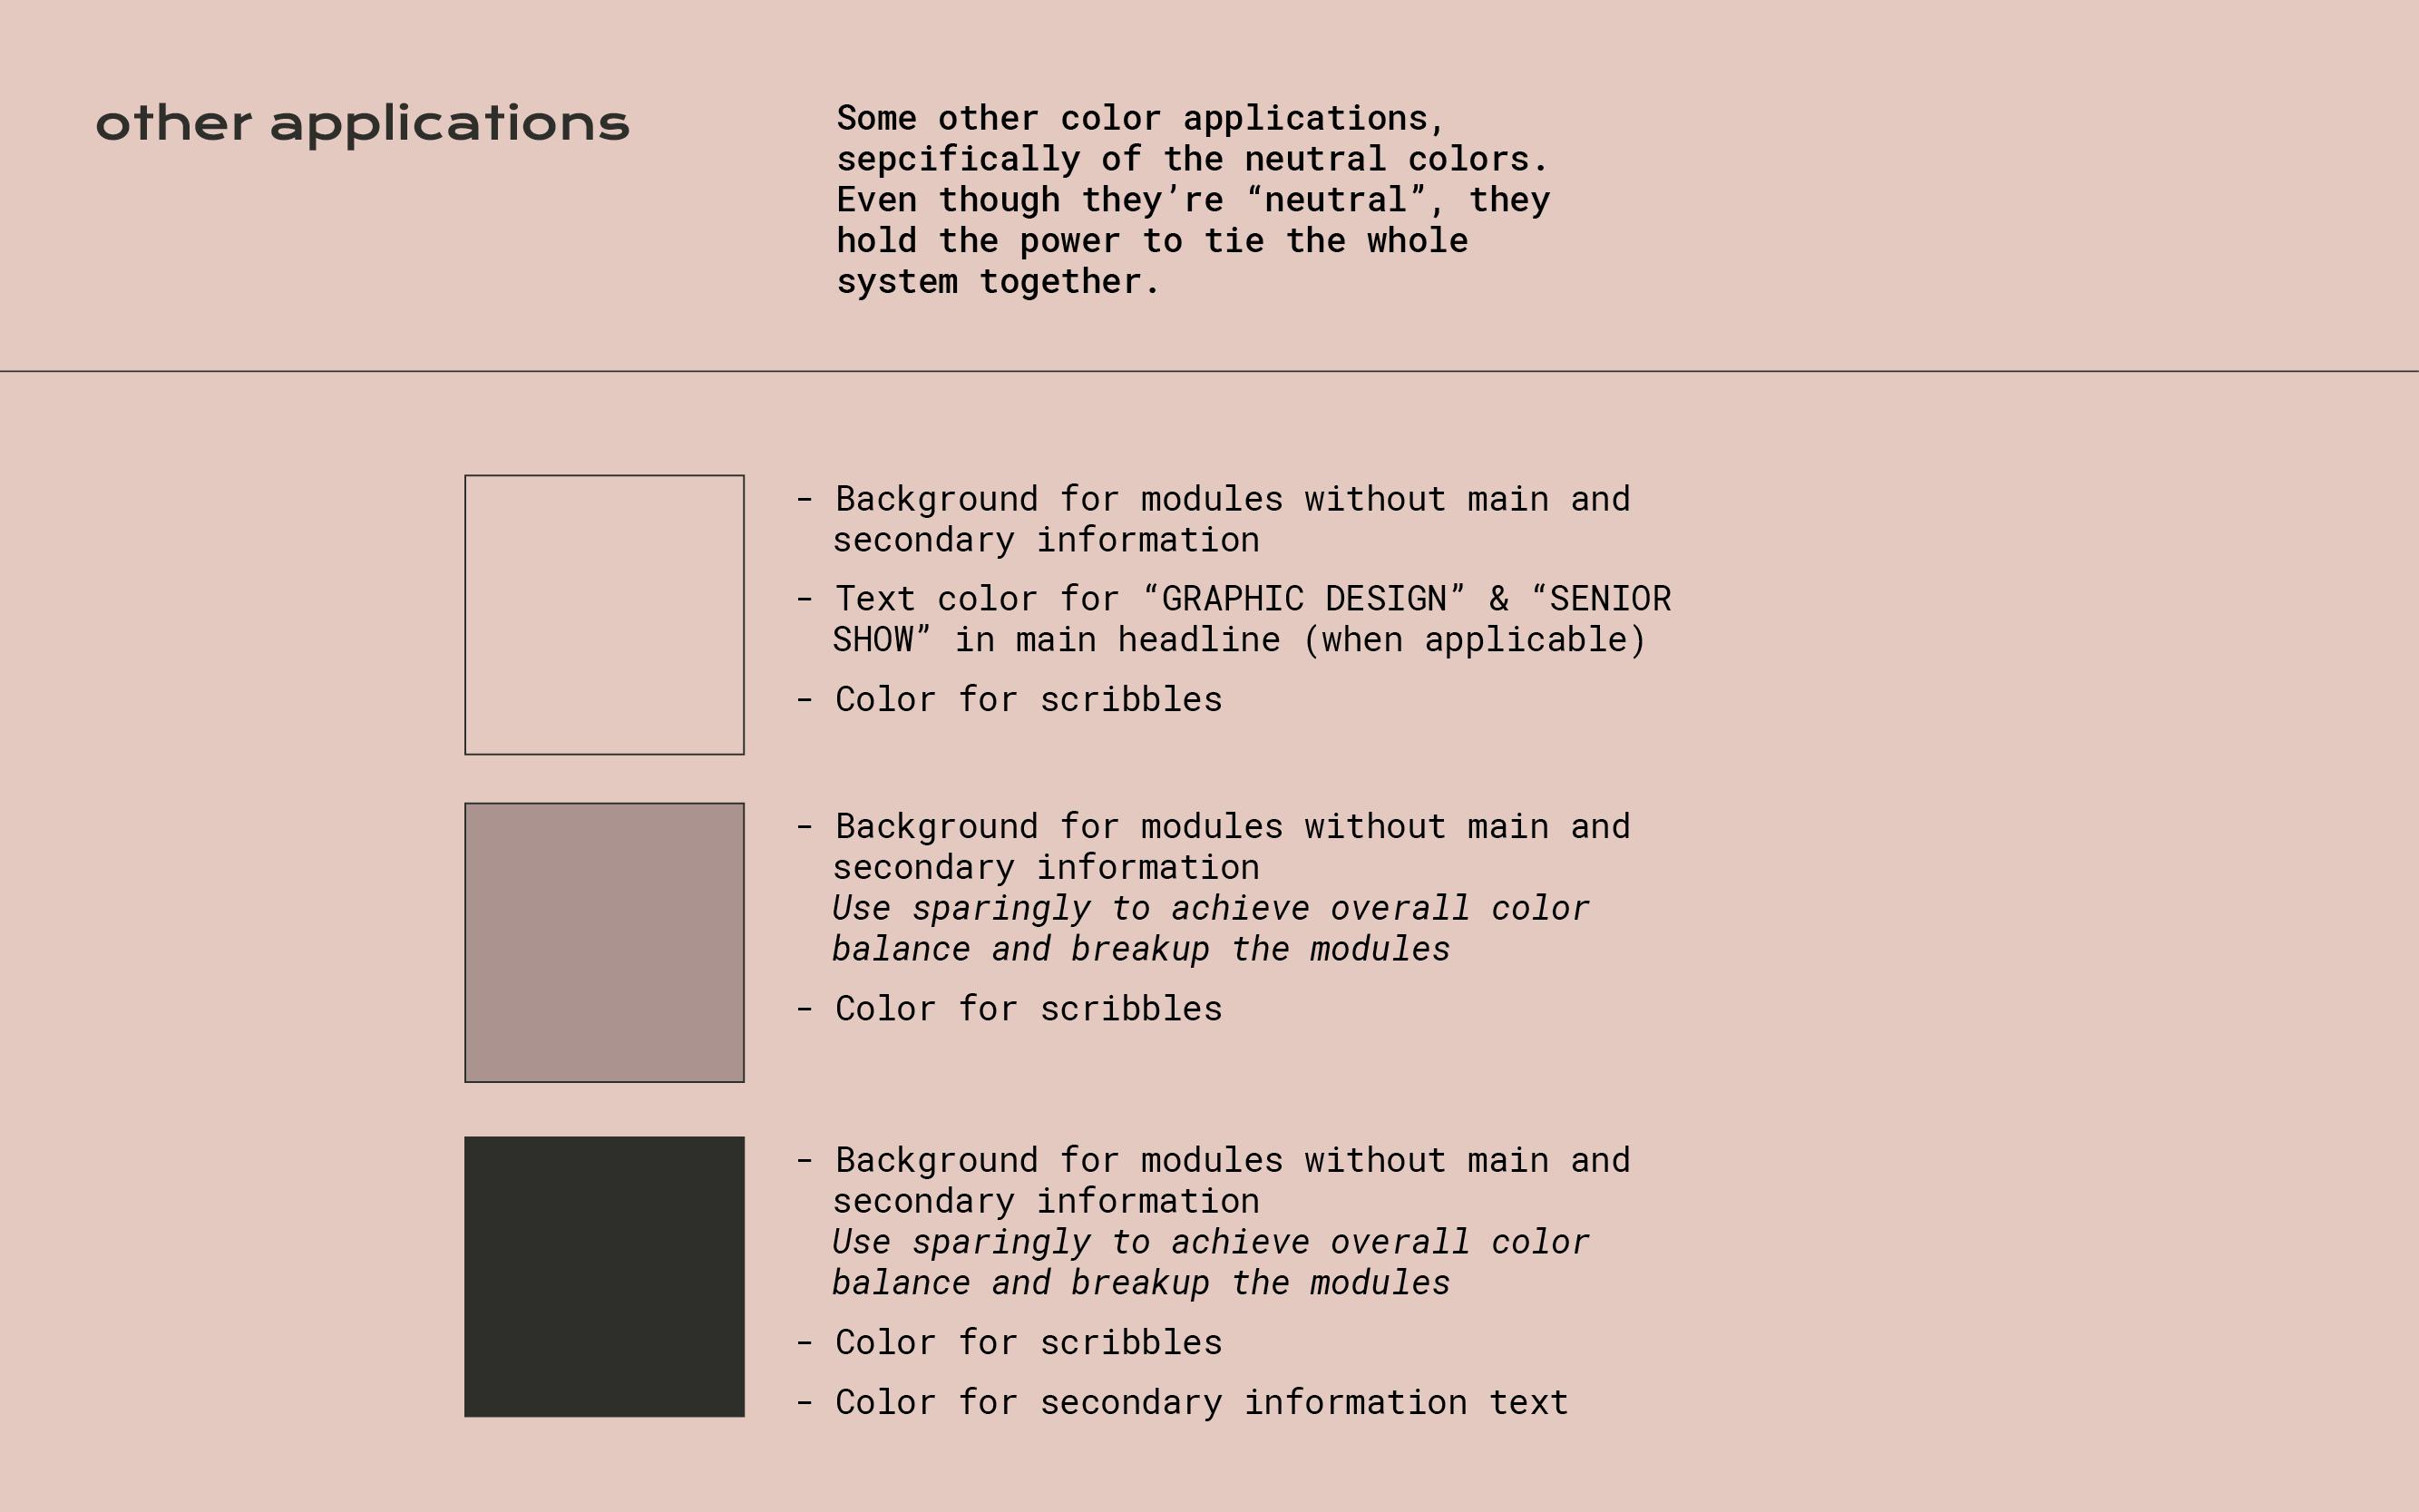 SS_Branding_Guidelines5